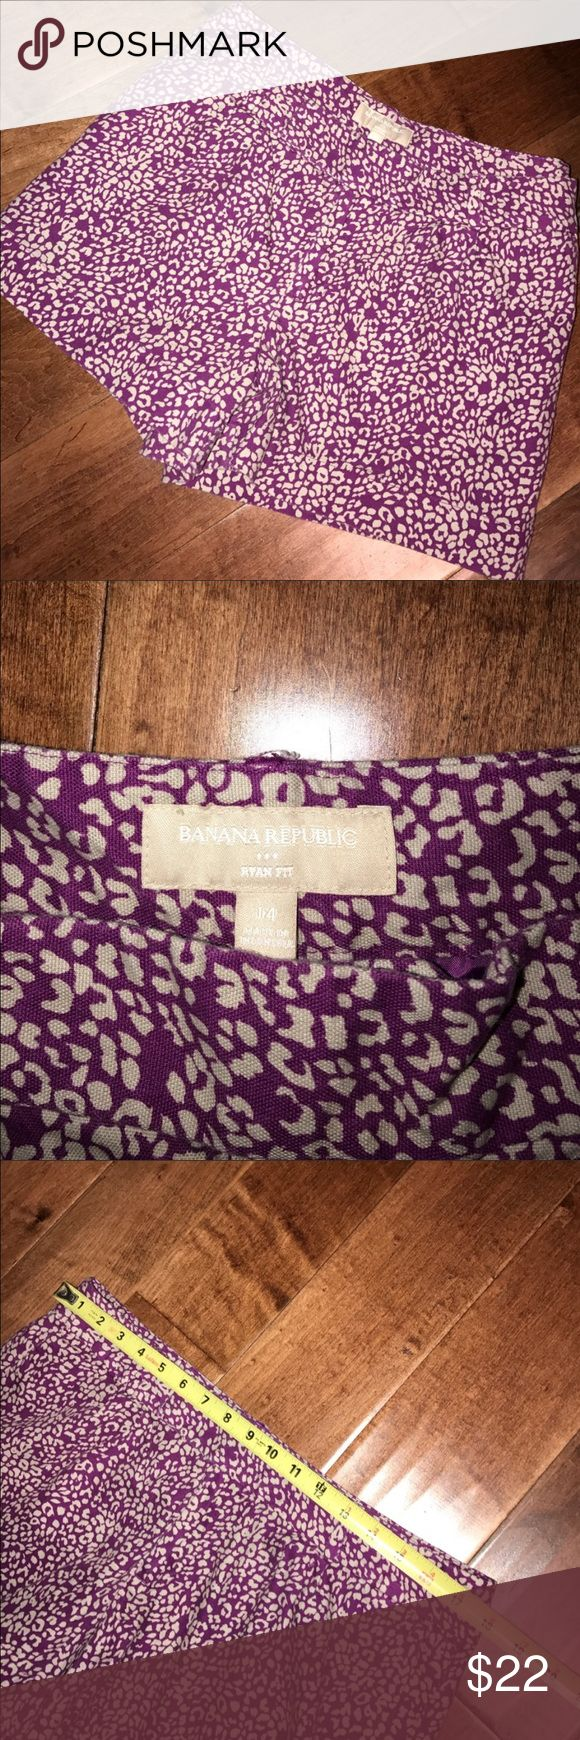 Banana Republic Plum Cheetah Shorts Great plum color with cream cheetah print. Great used condition. Soooo cute! 97% cotton 3% spandex. Banana Republic Shorts Cargos